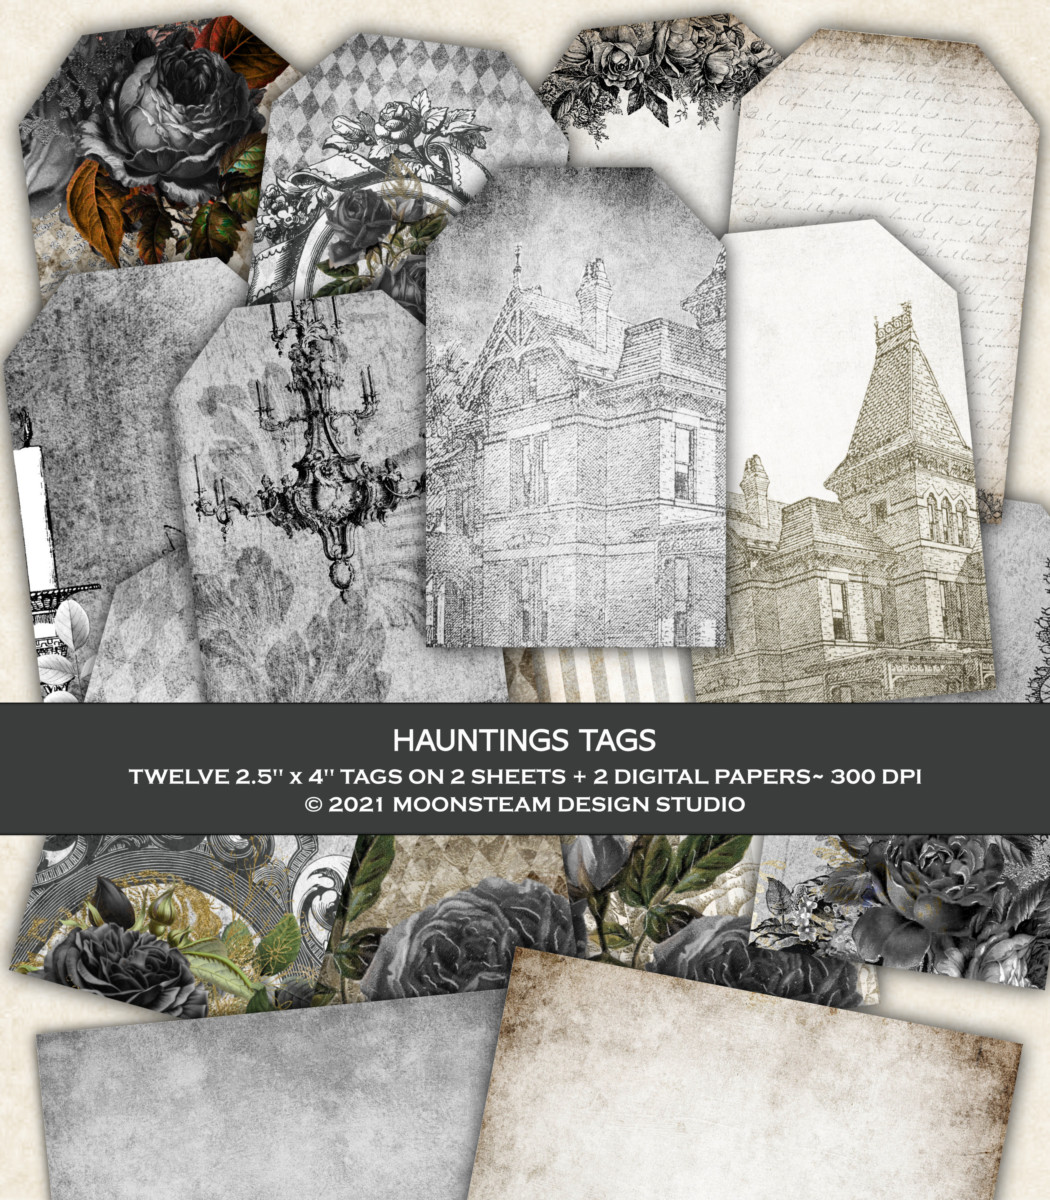 Hauntings Printable Tags by Moonsteam Design Studio